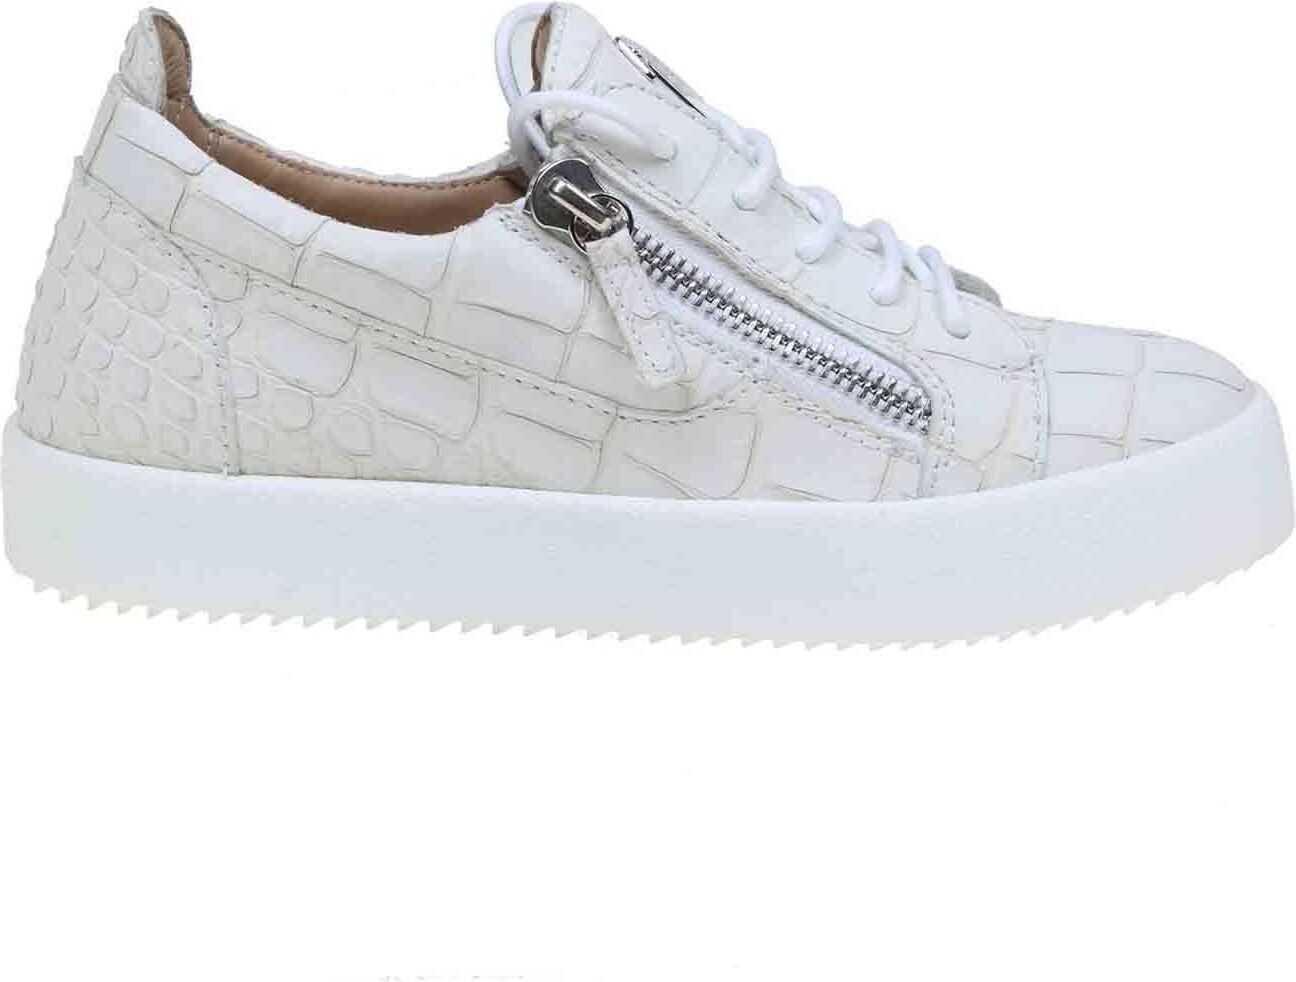 Giuseppe Zanotti Gail Coco Sneakers In White Leather White